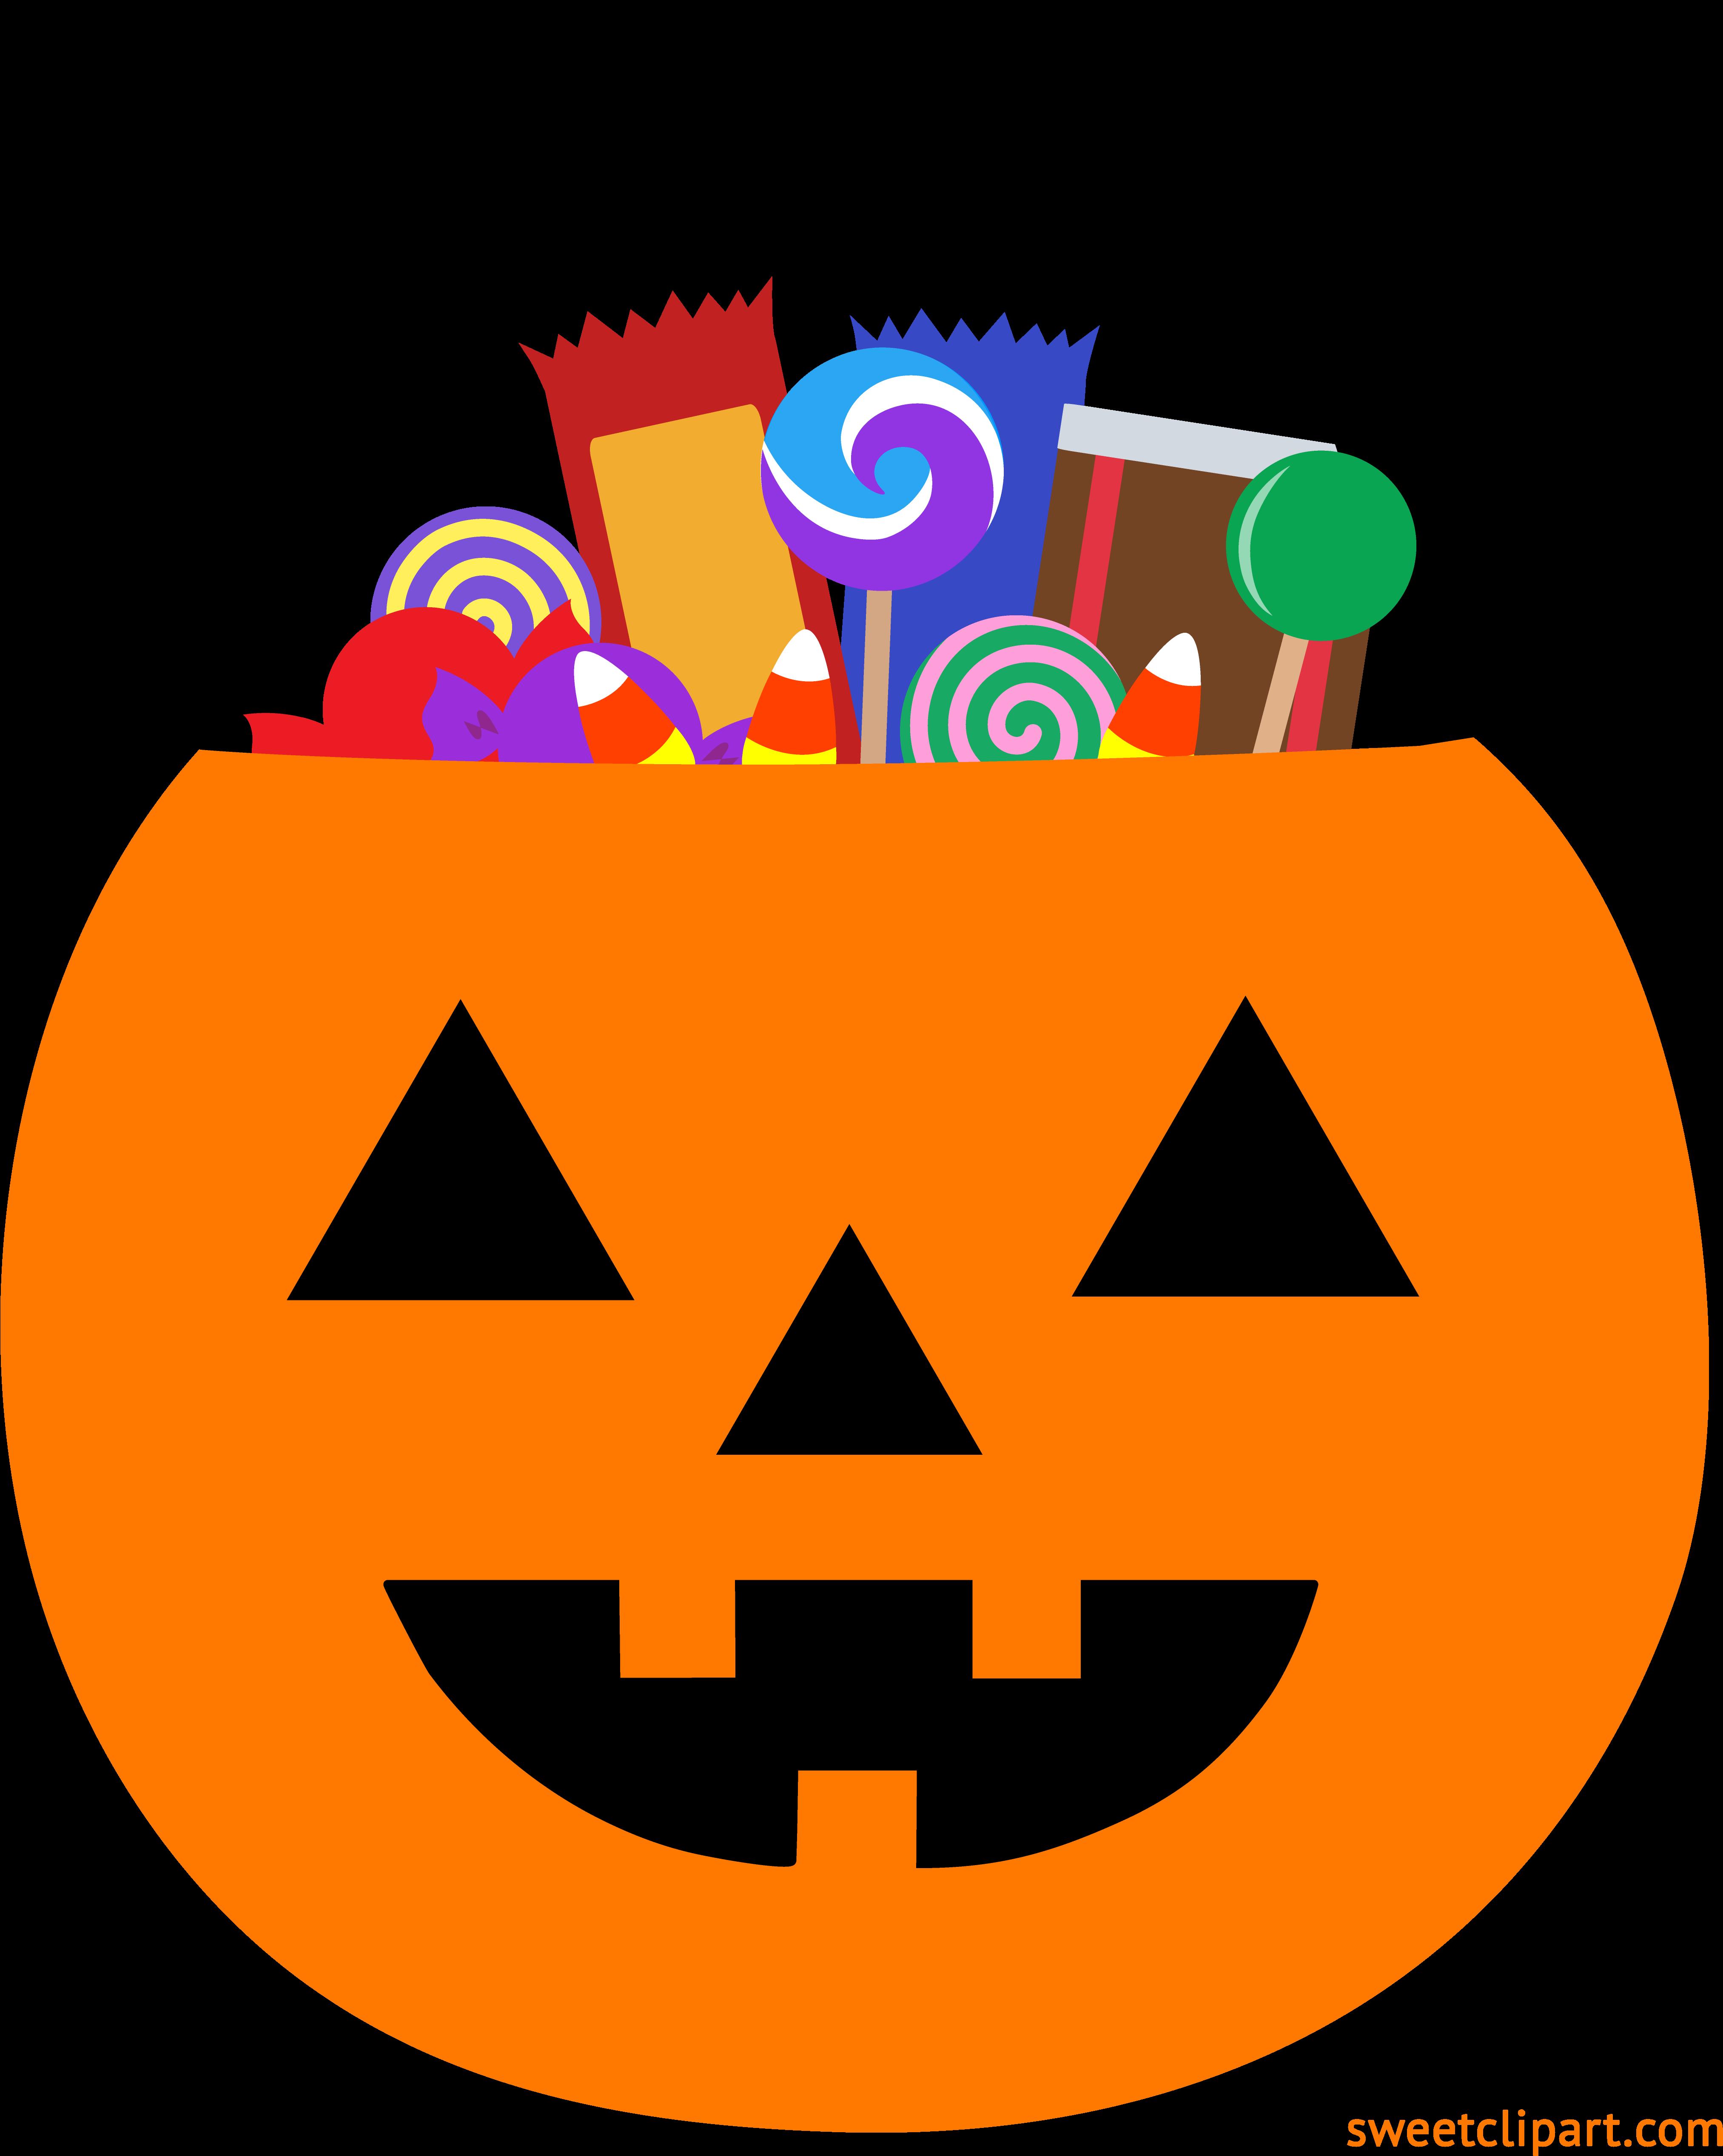 Clipart pumpkin pail. Hd halloween with candy